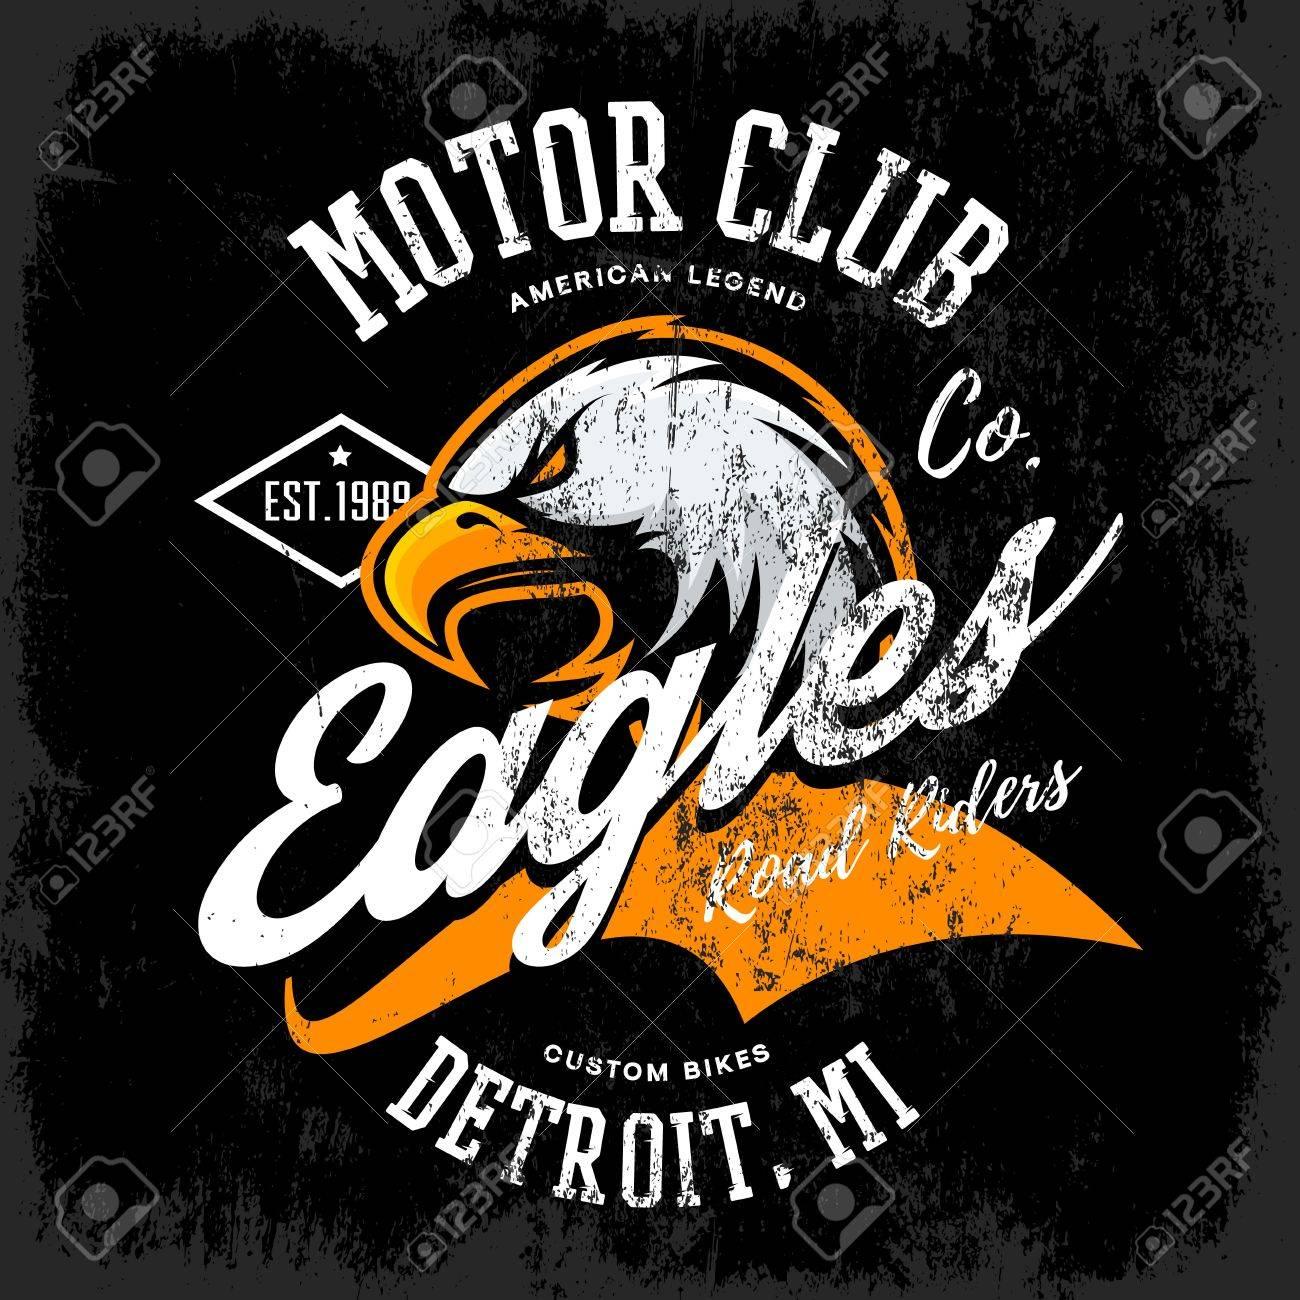 Vintage American furious eagle custom bike motor club tee print vector design isolated on dark background. Michigan, Detroit street wear t-shirt emblem. Premium quality wild bird superior logo concept illustration. - 73479289